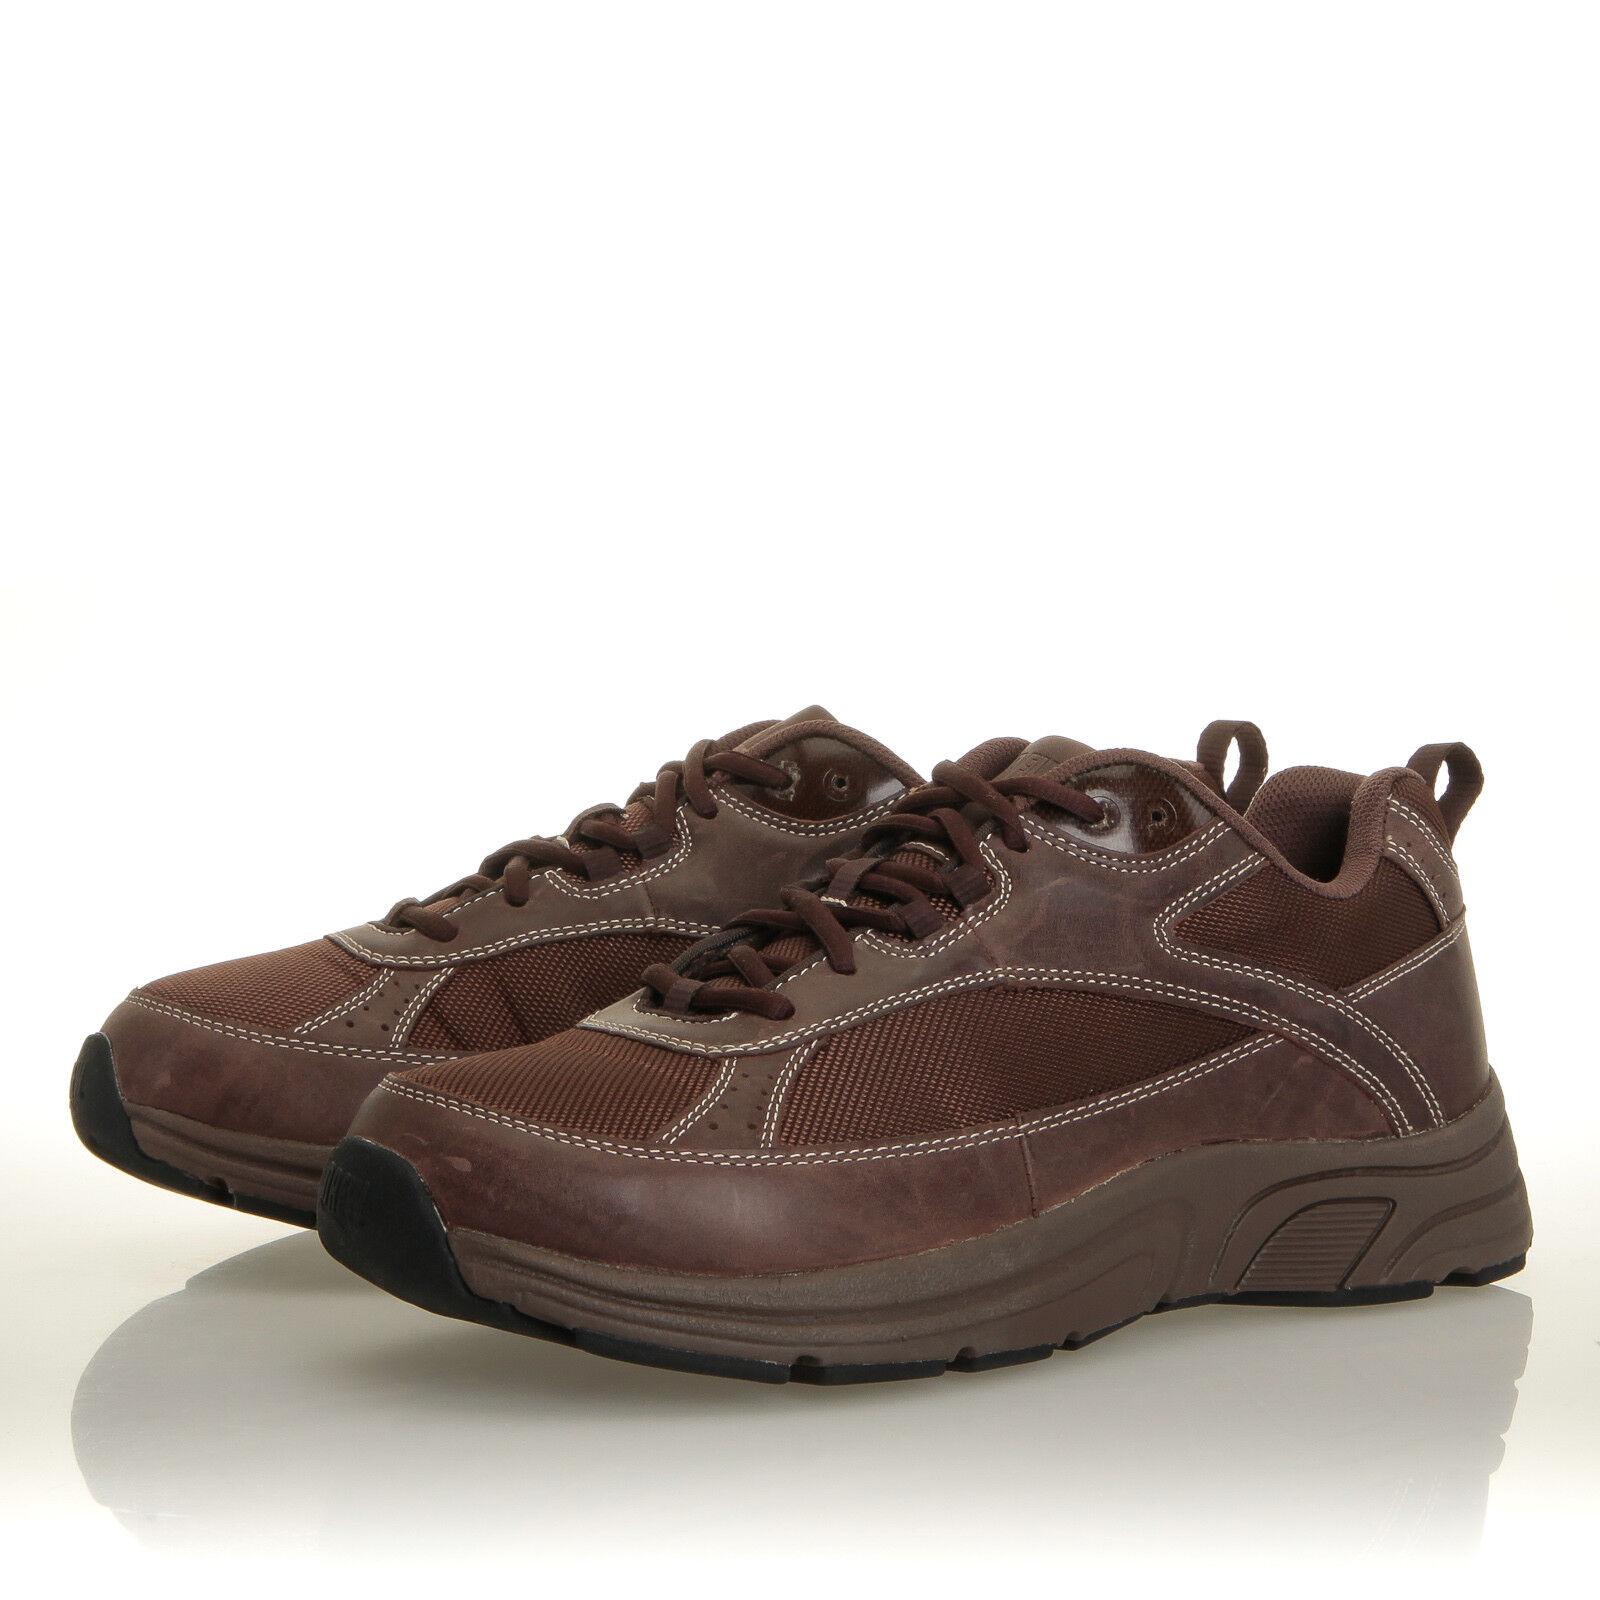 Drew Aaron marrone Pelle Therapeutic Walking Taglia Shoe - Uomo Taglia Walking 9 6E 29fe04